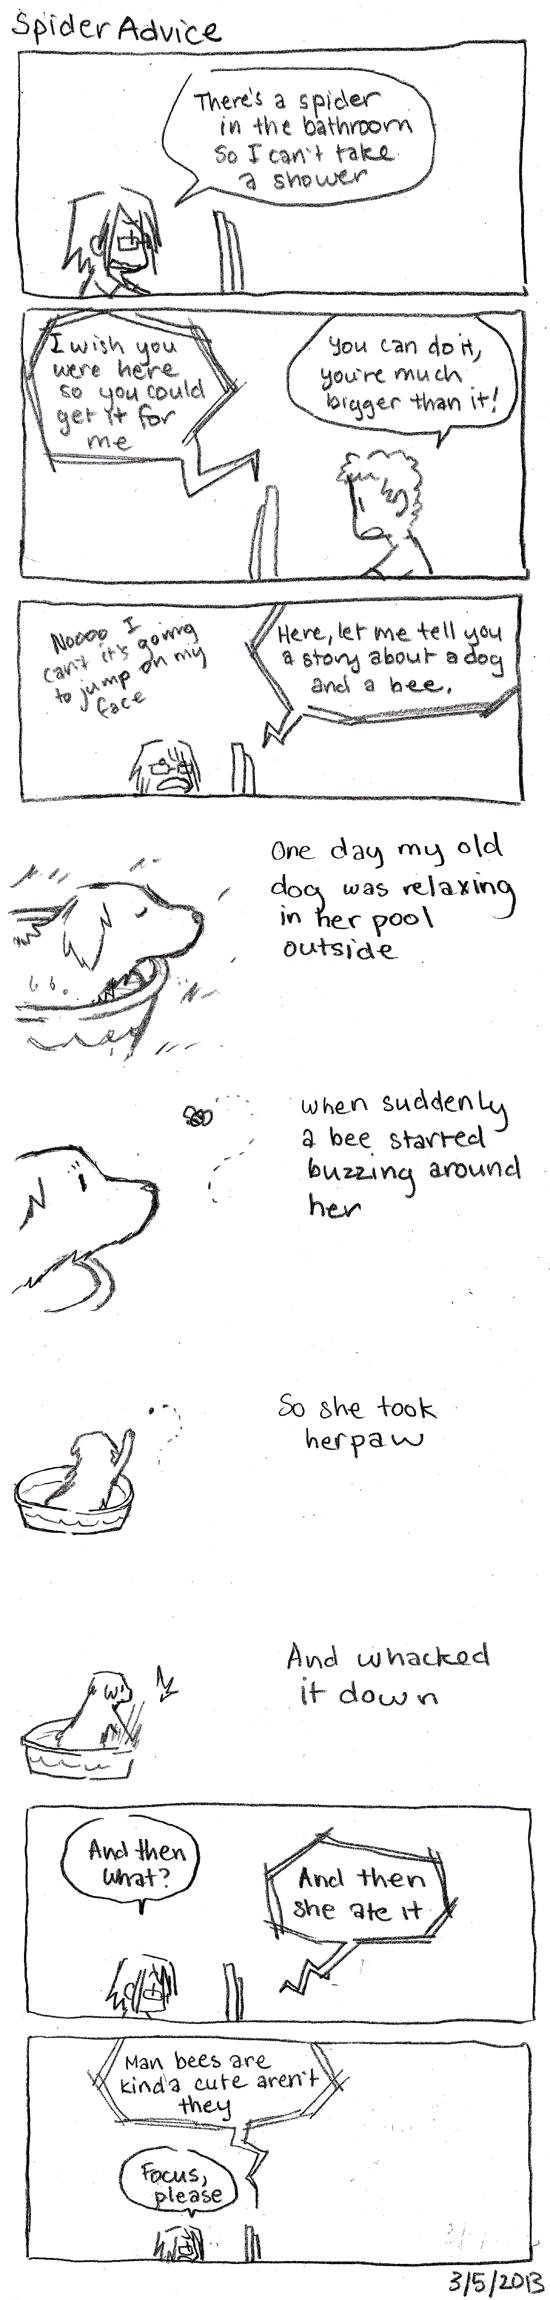 Spider Advice